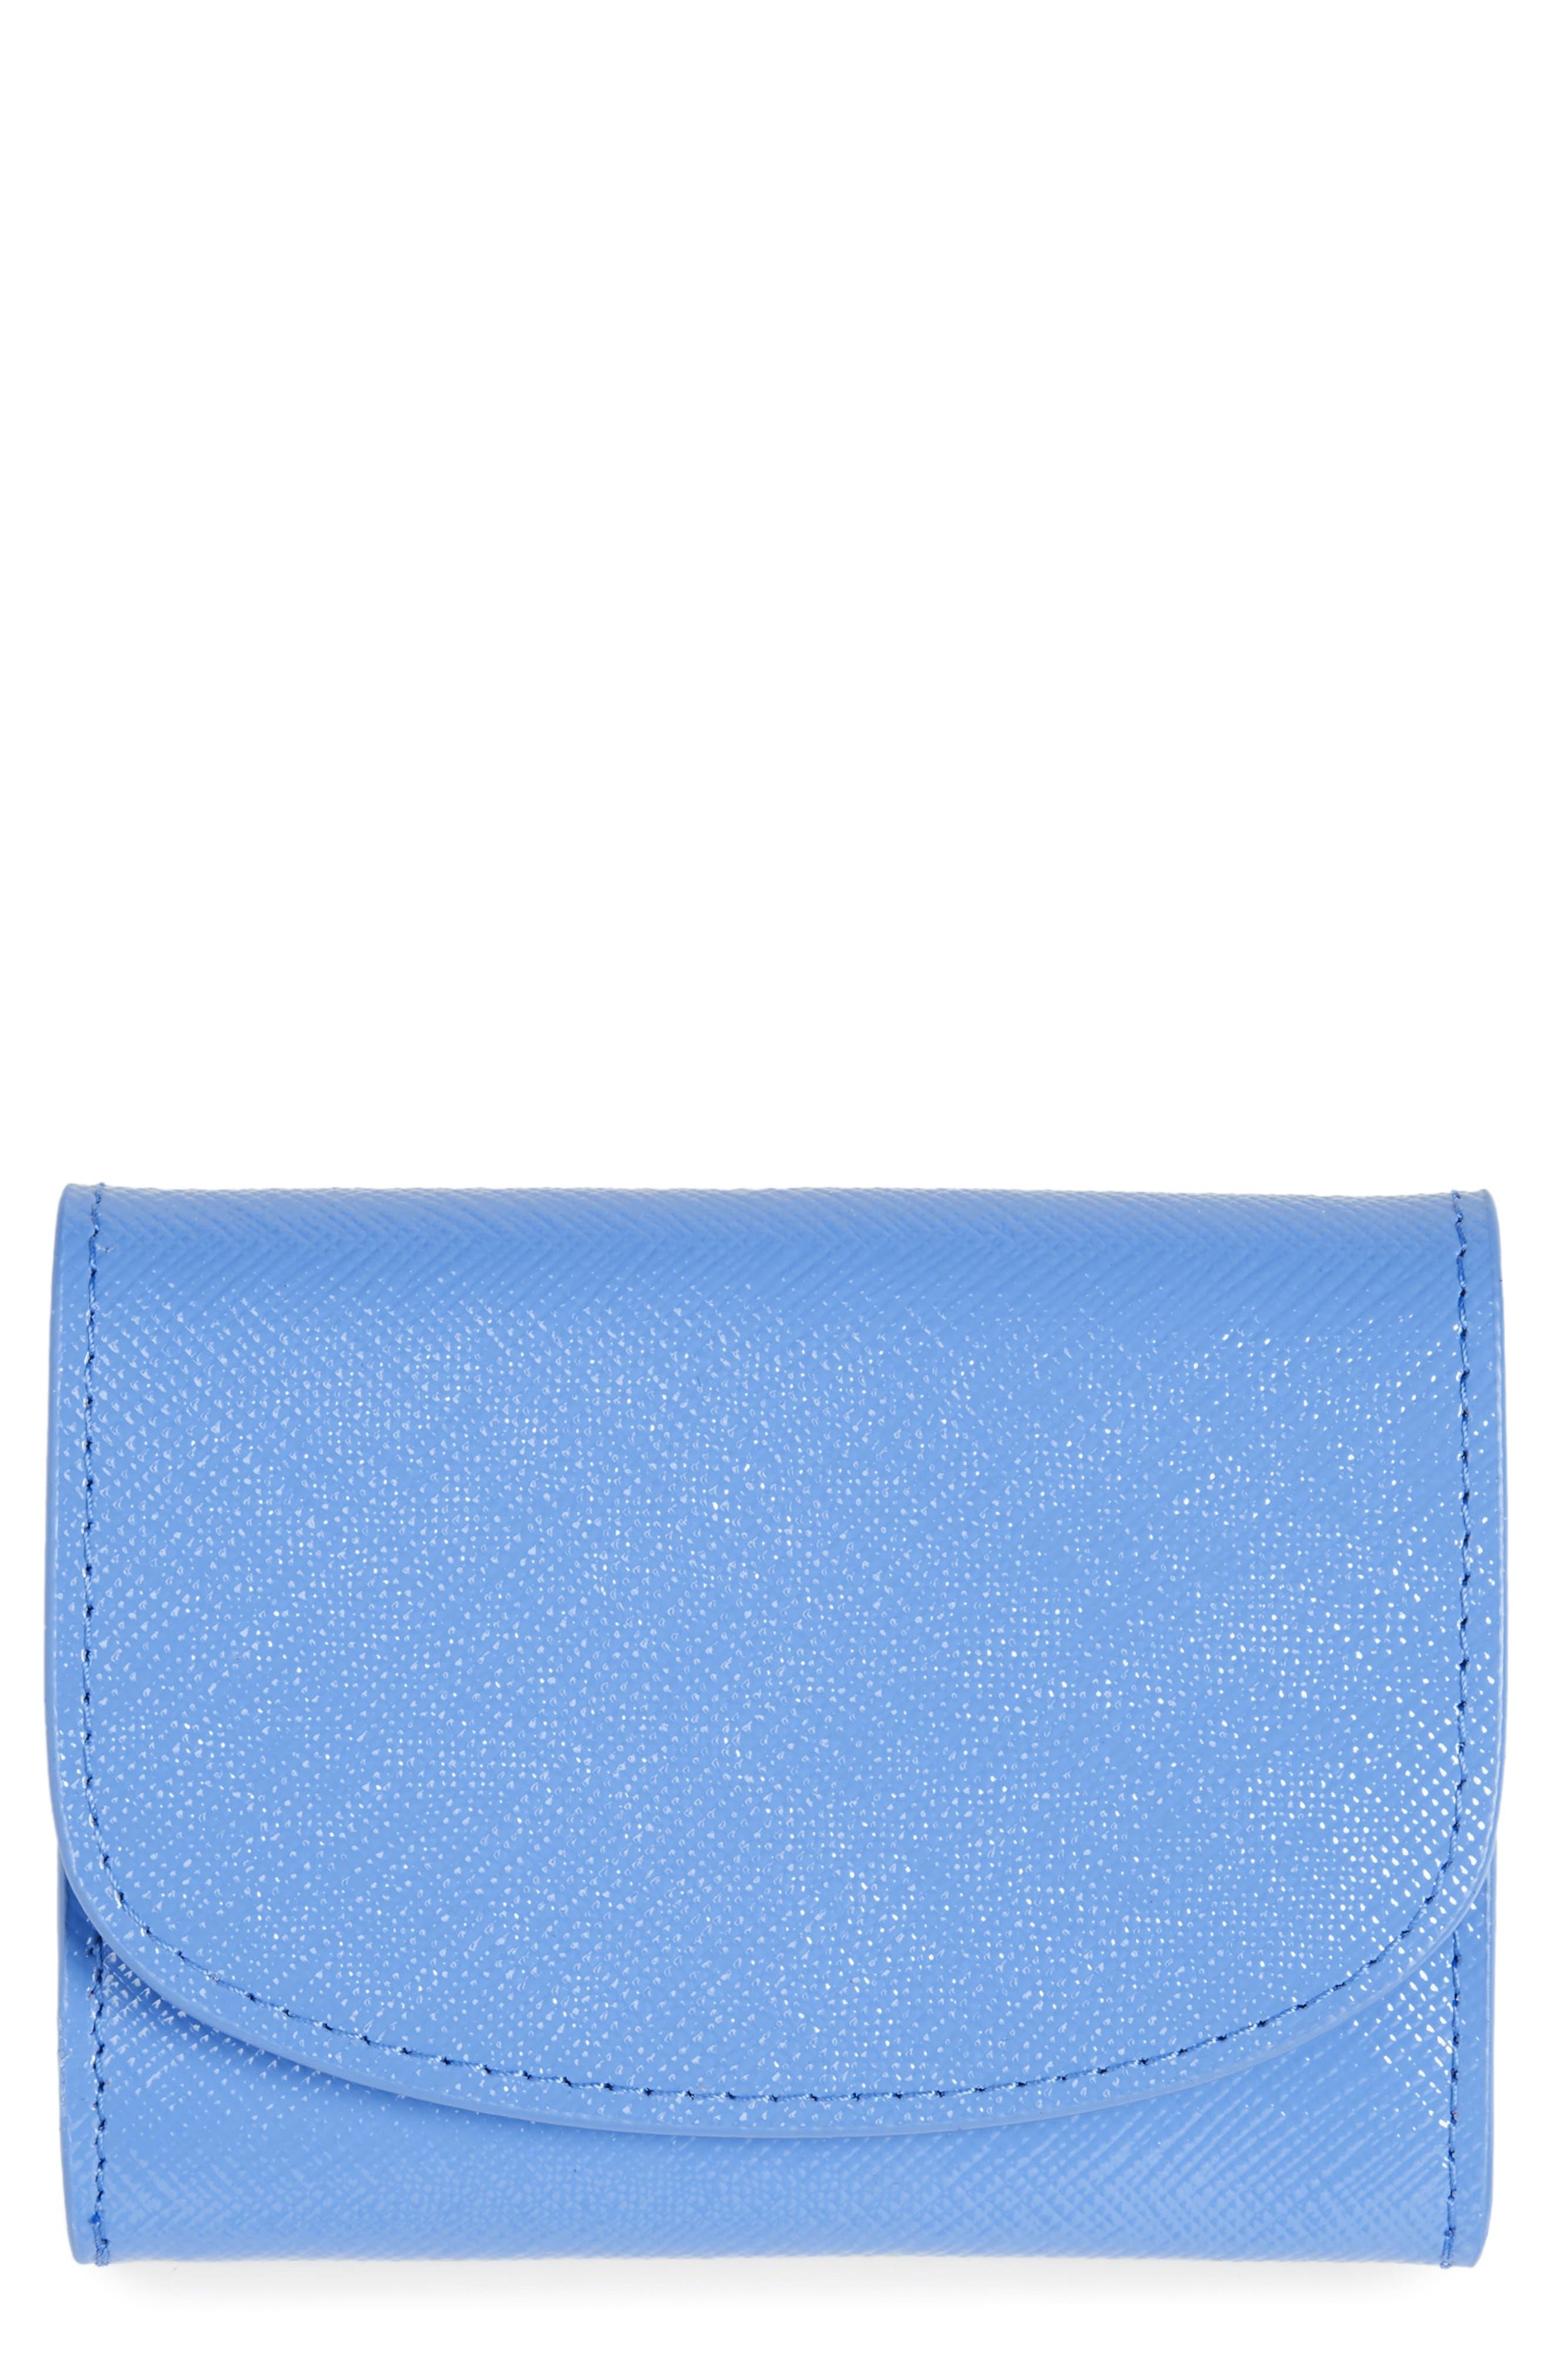 Main Image - Nordstrom Leather Card Holder